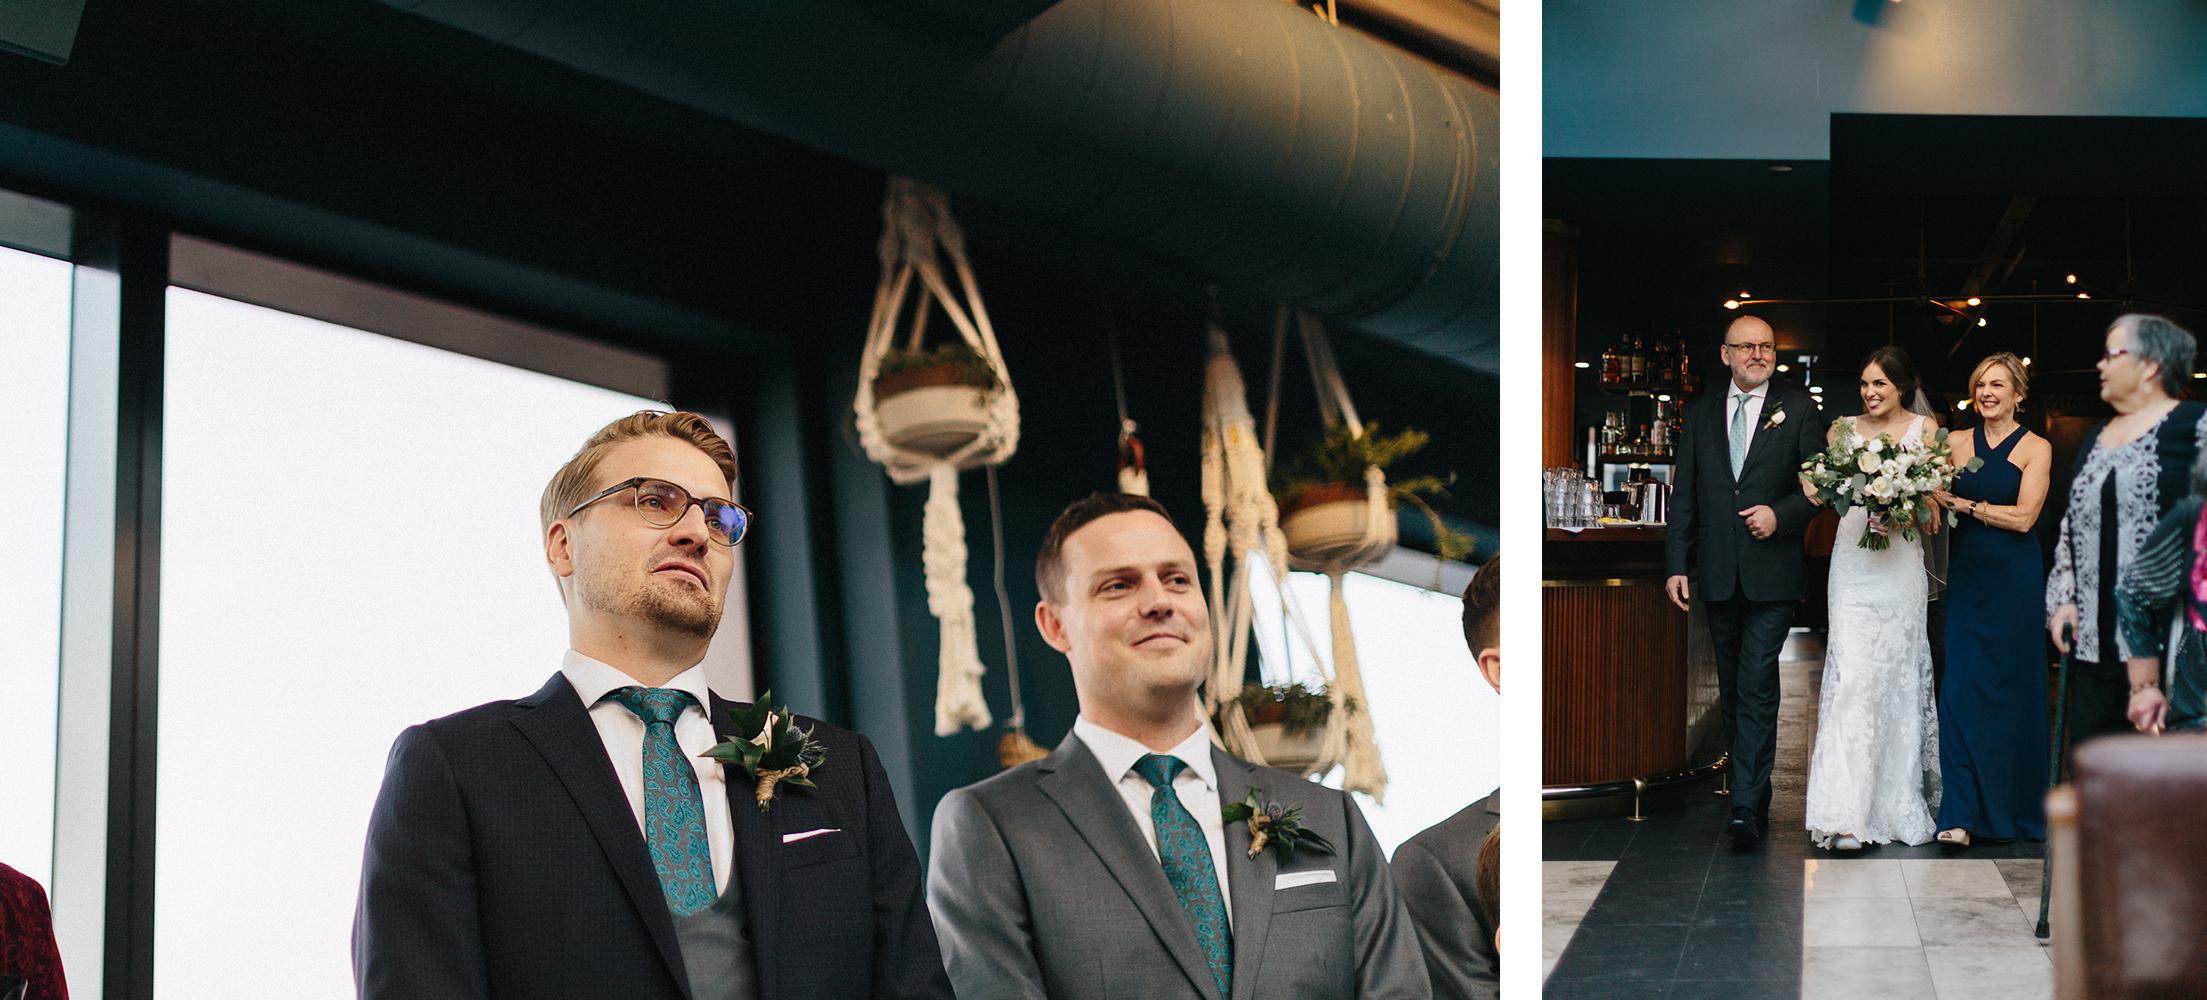 broadview-hotel-REAL-wedding-photos-best-wedding-venues-toronto-analog-film-wedding-photography-boutique-hotel-27.jpg